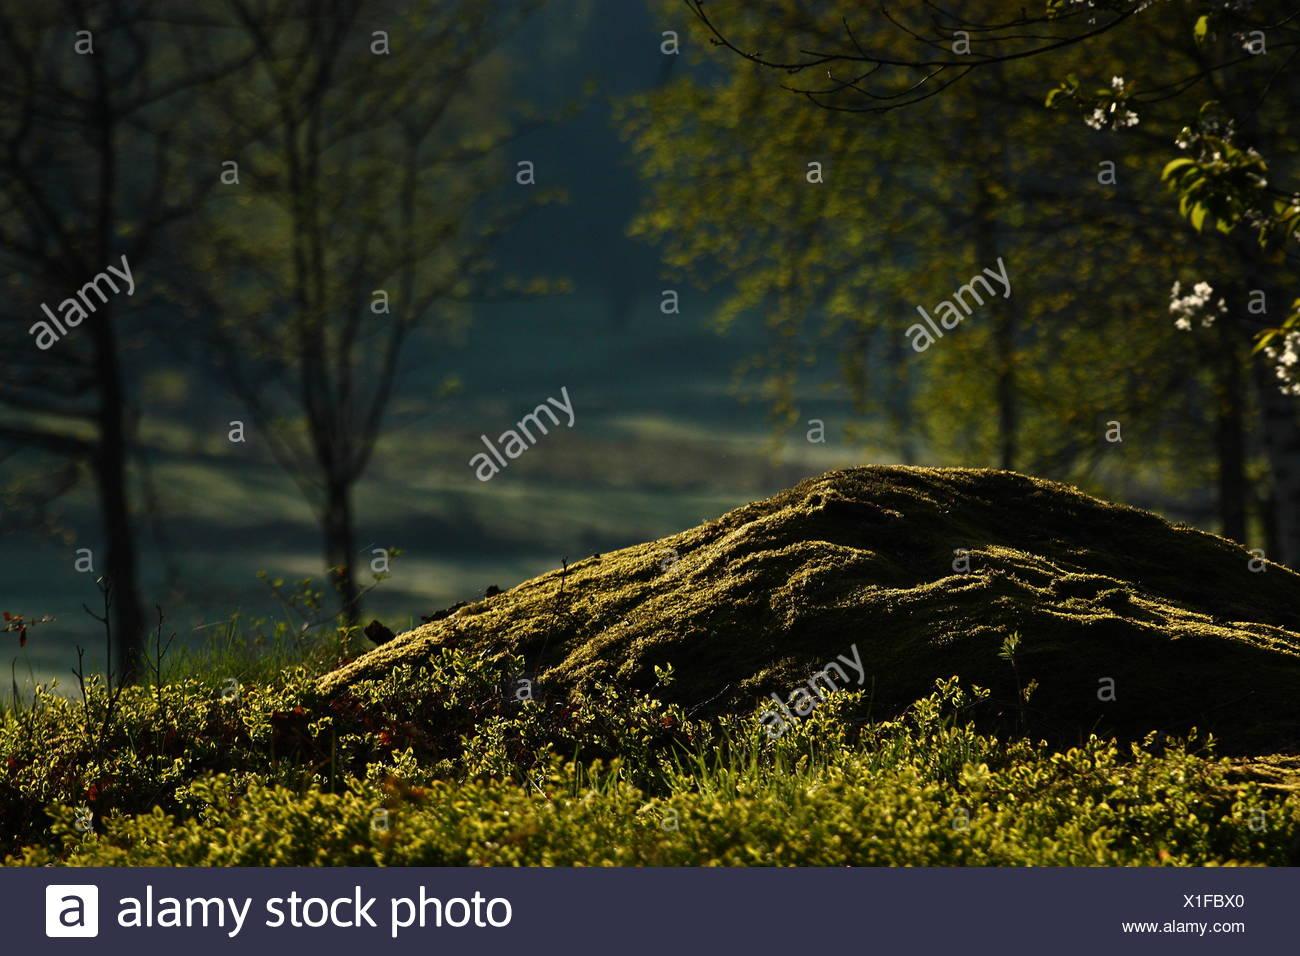 fruit tree blossoms - Stock Image